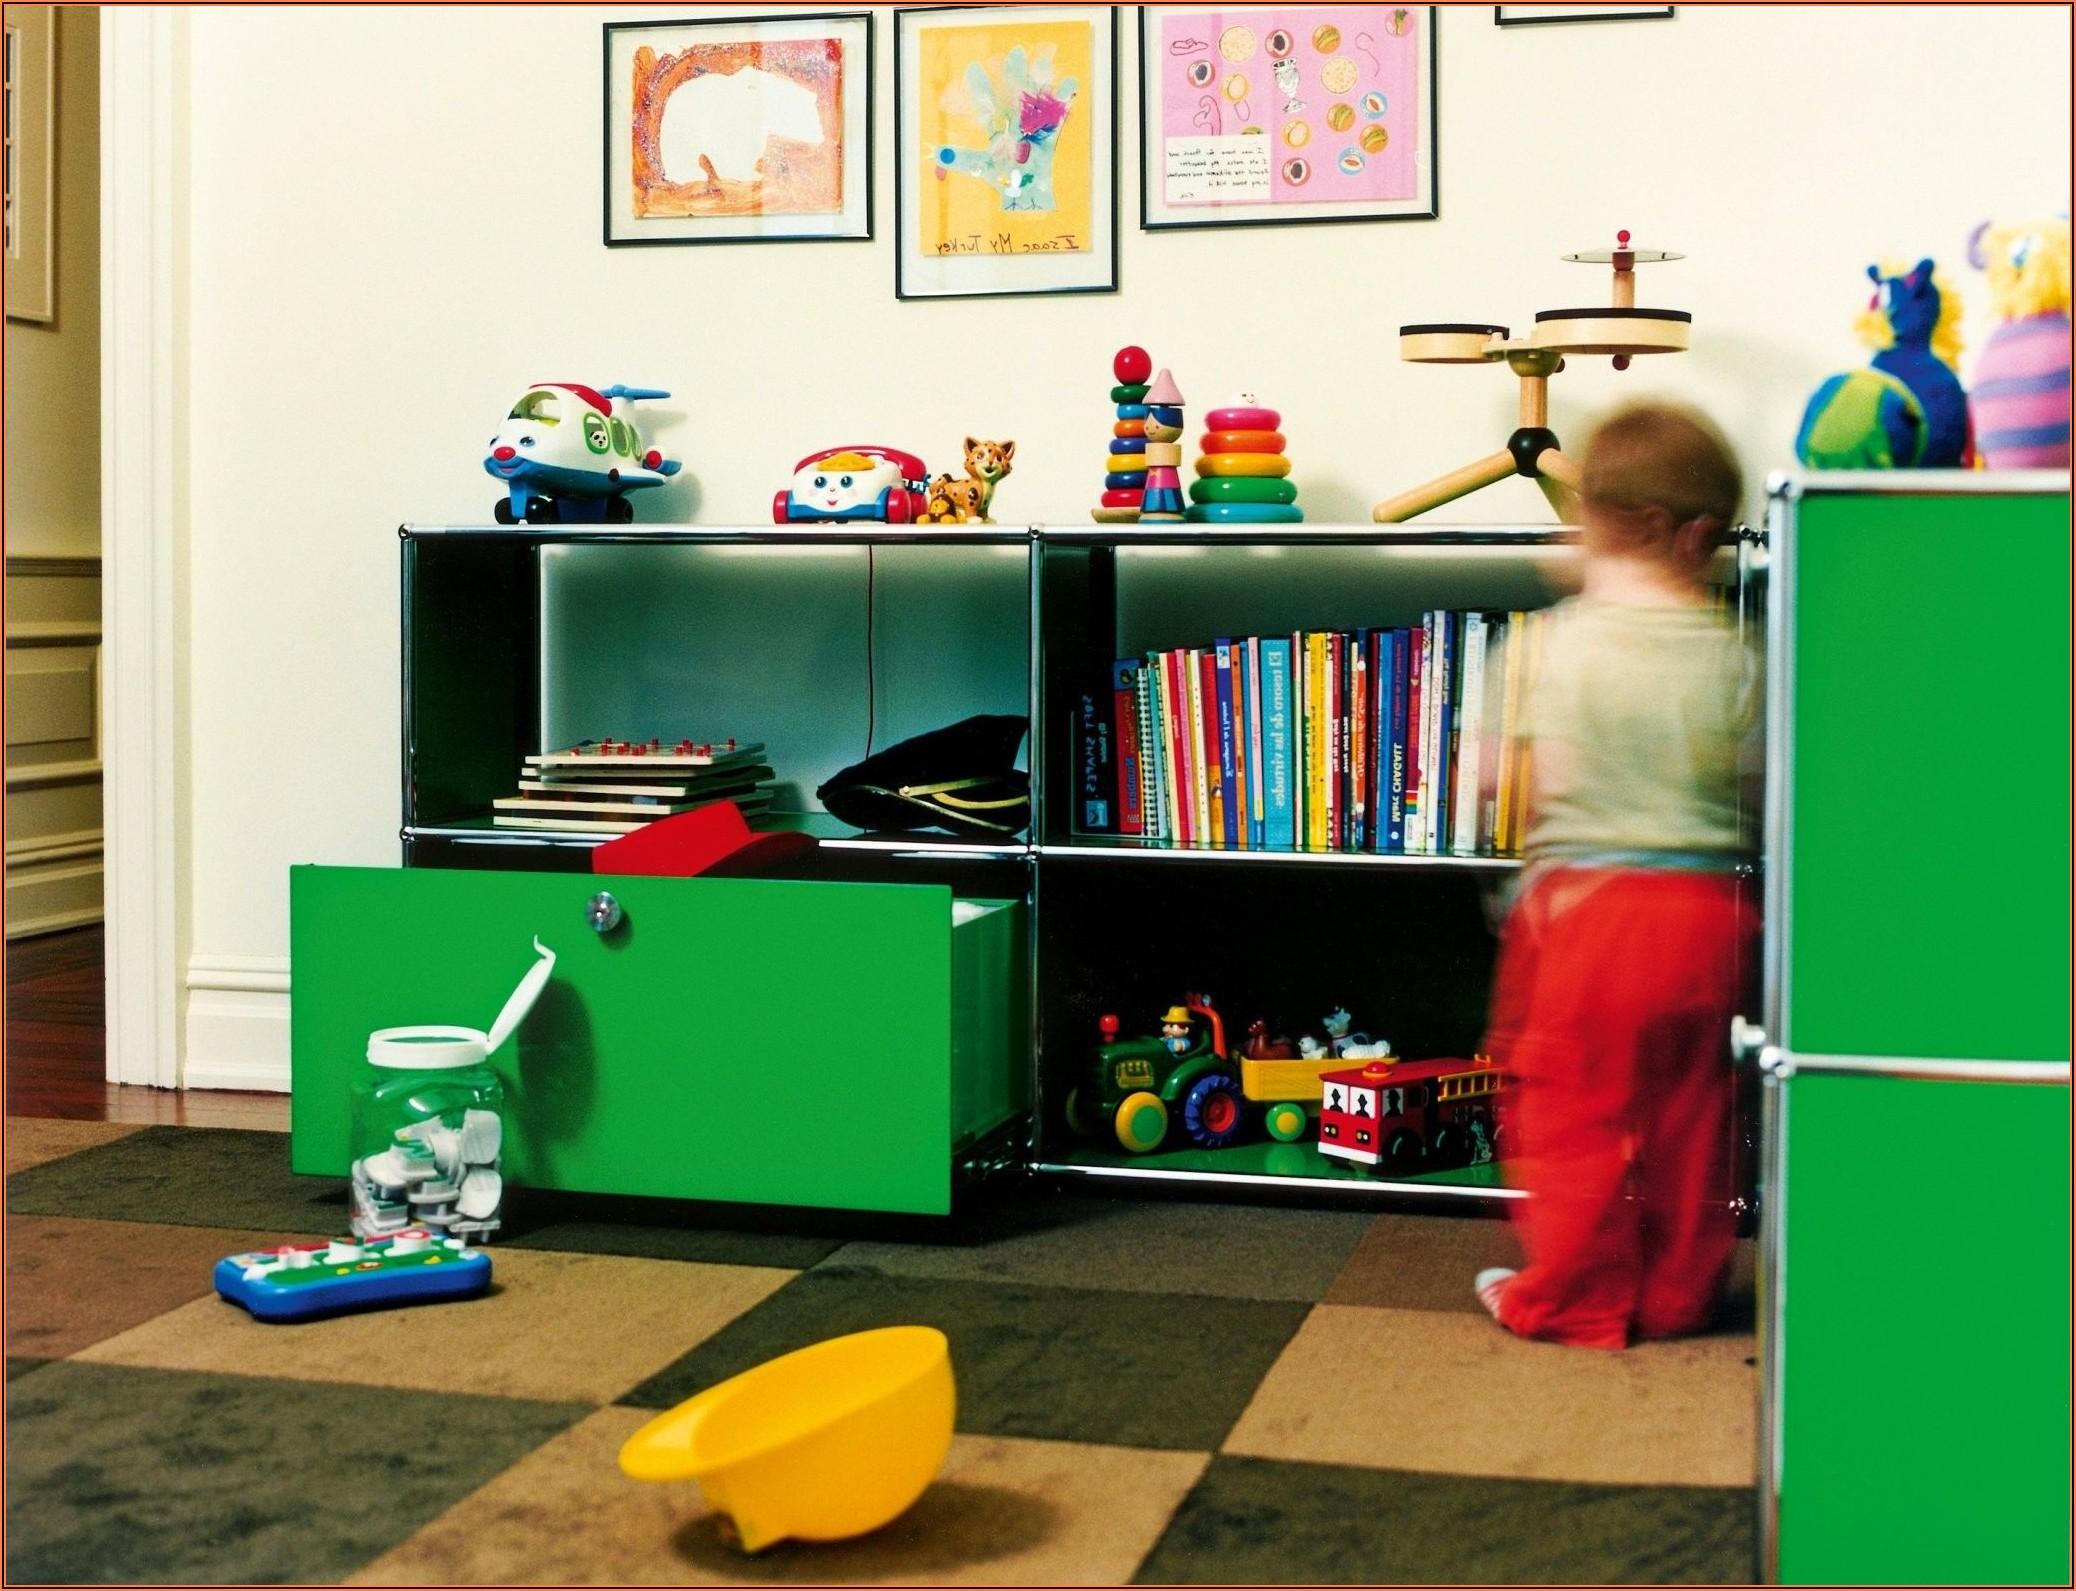 Kita Kinderzimmer Hamburg Standorte